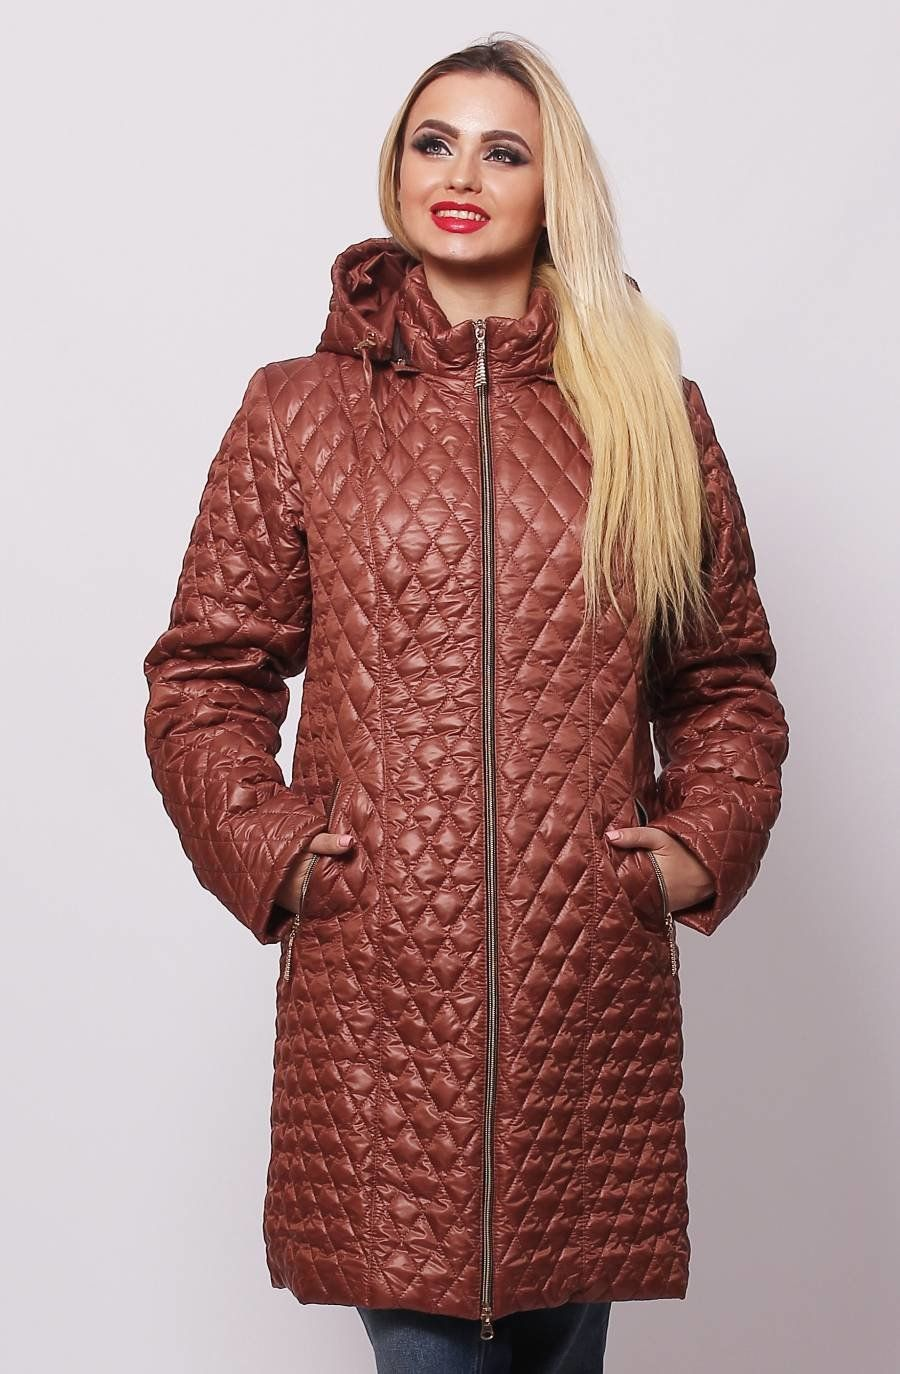 Коричнева куртка Саманта - купити недорого — Donna Bella - MF-КС11-4-40 6c0912ac3891e